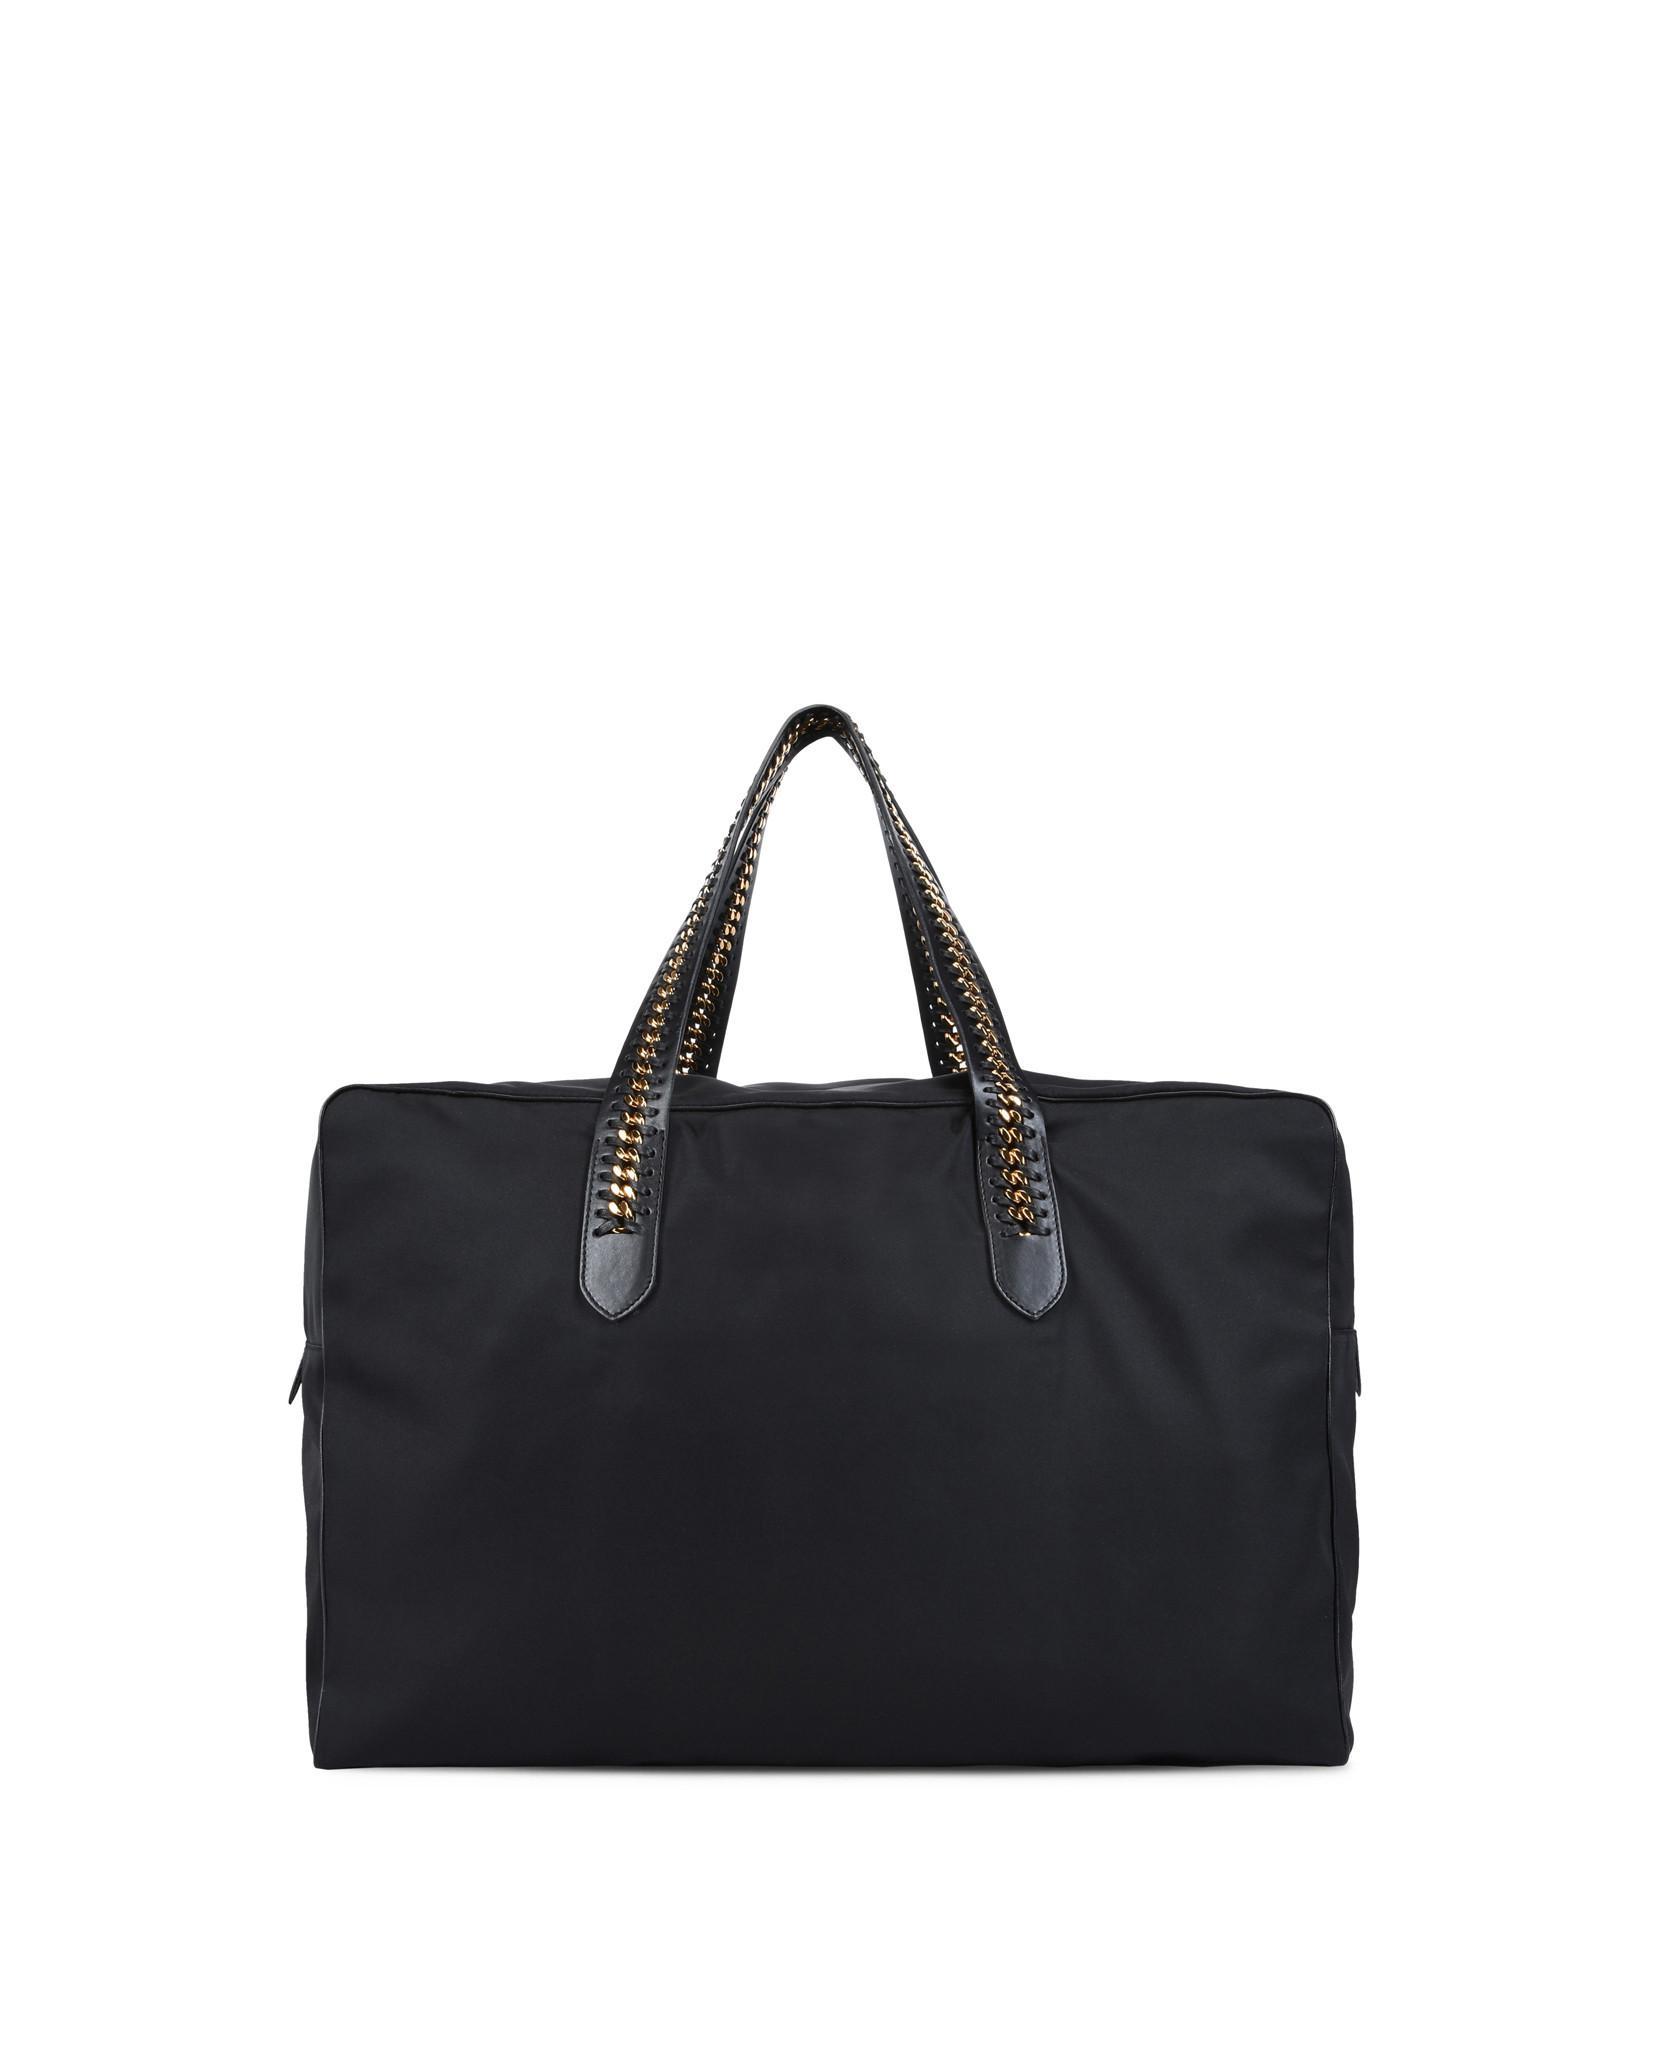 Stella Mccartney Lesportsac Travel Bags